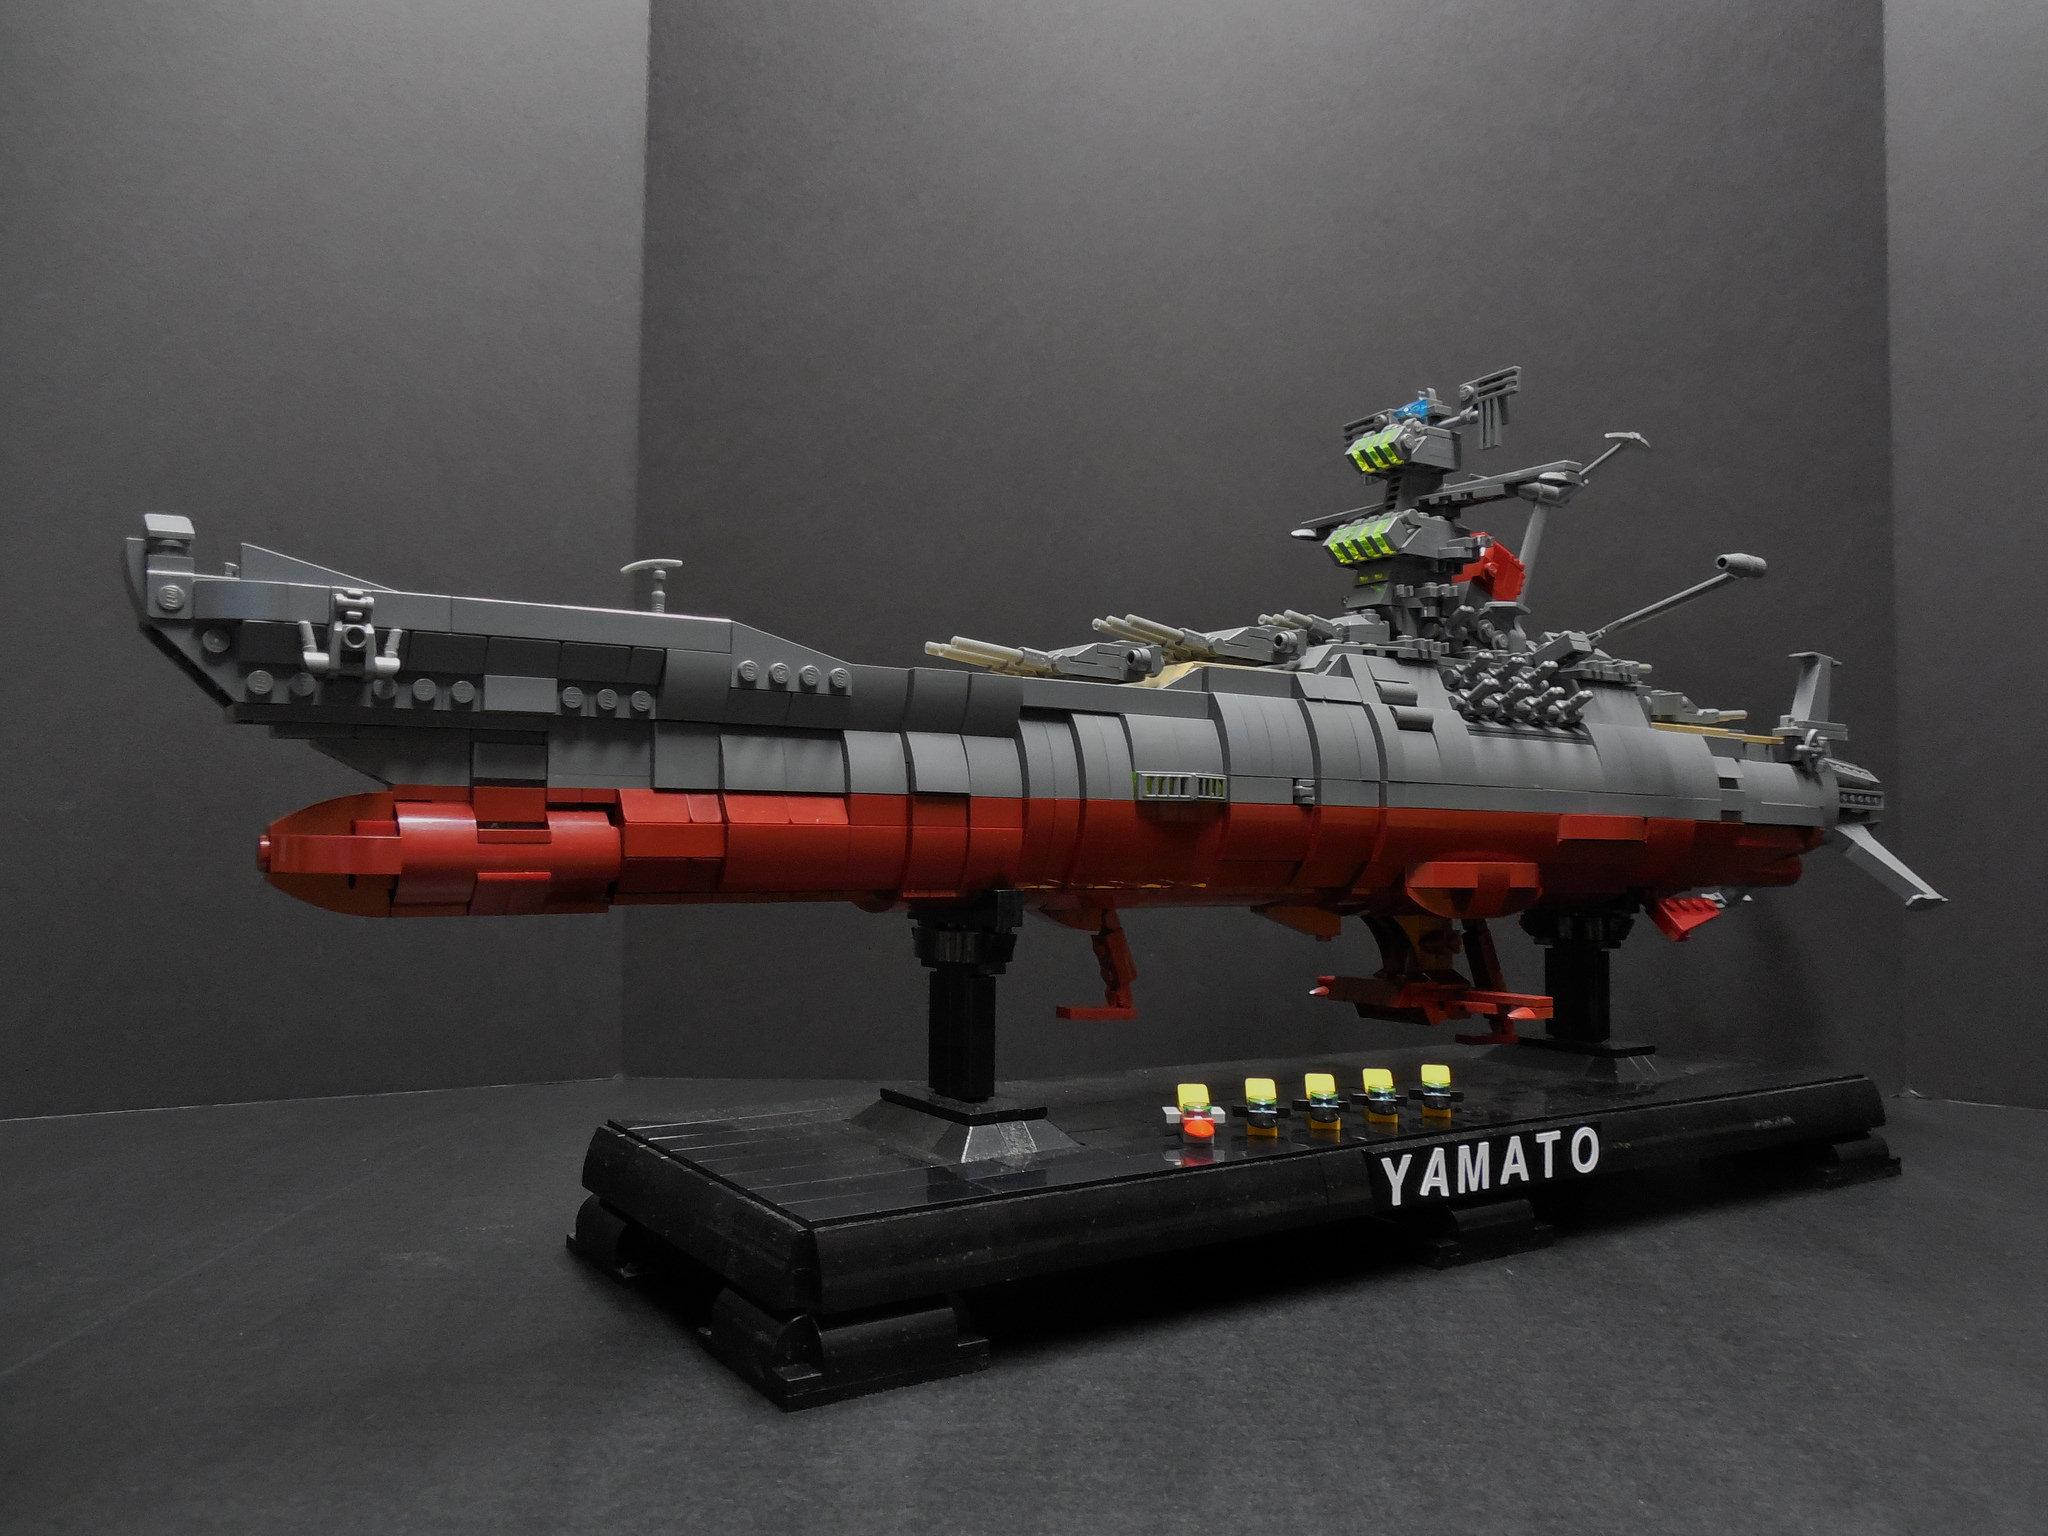 Lego Starblazers Yamato